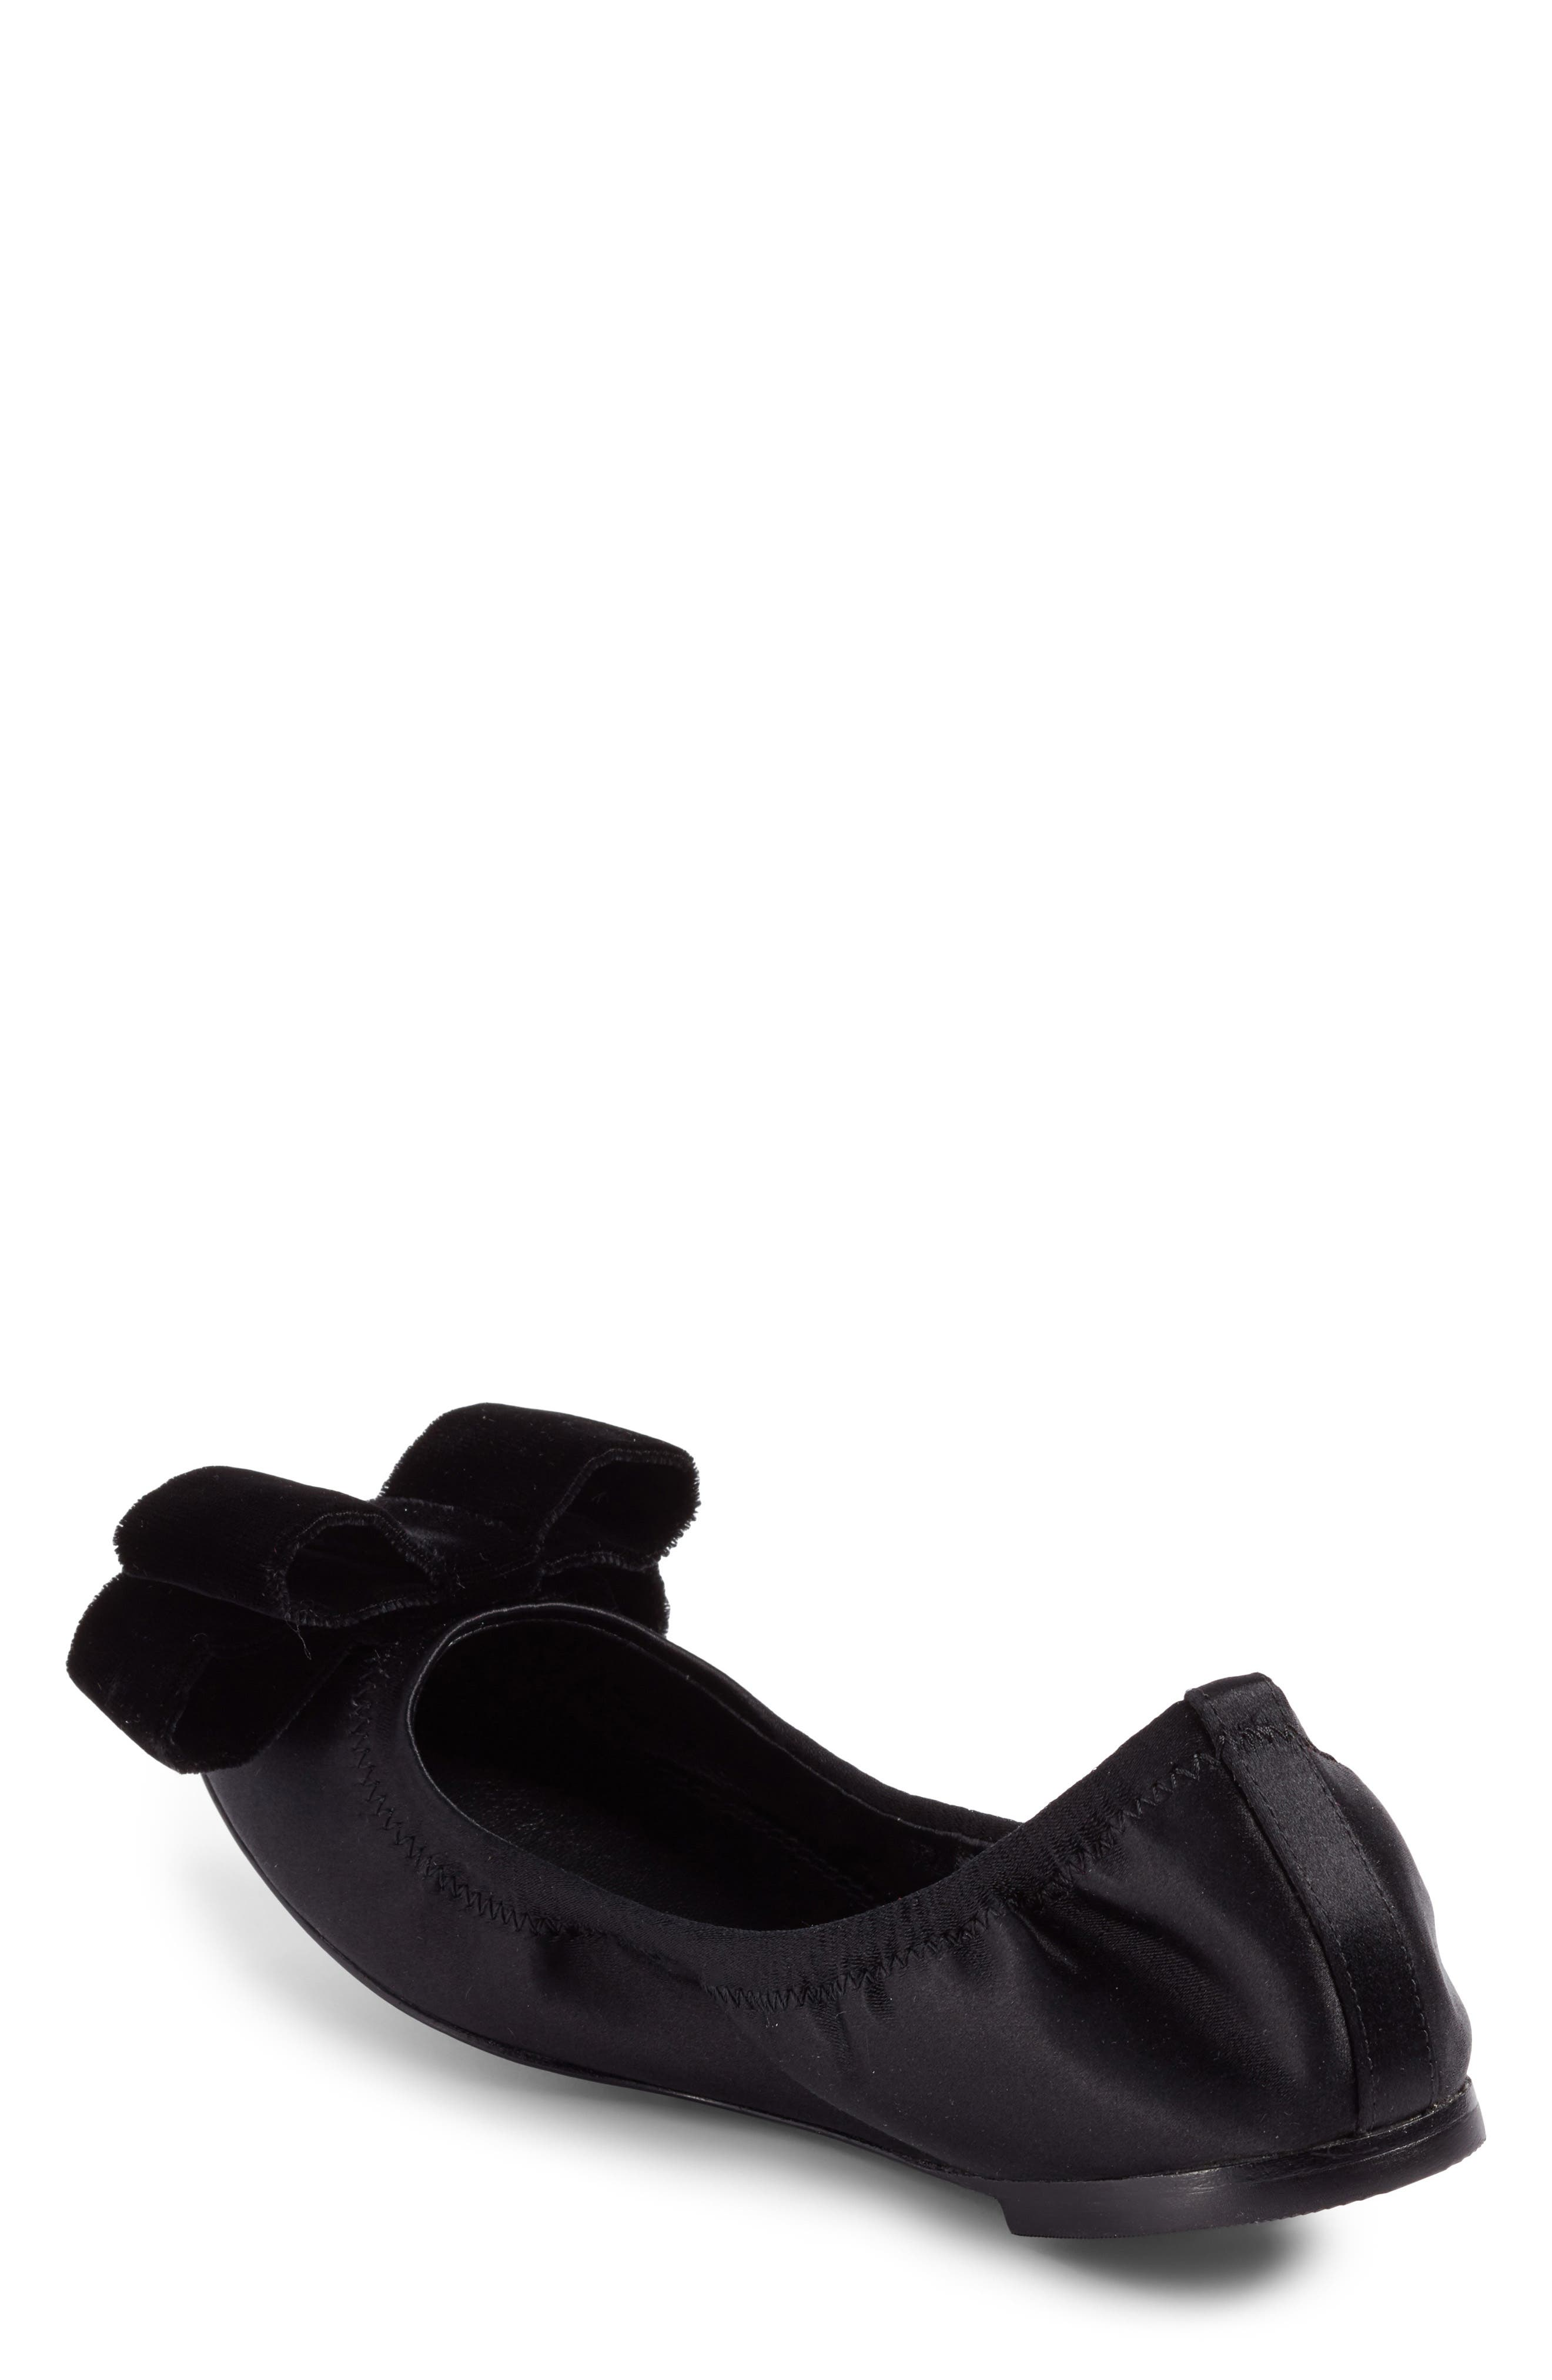 Alternate Image 2  - Tory Burch Viola Bow Ballet Flat (Women)